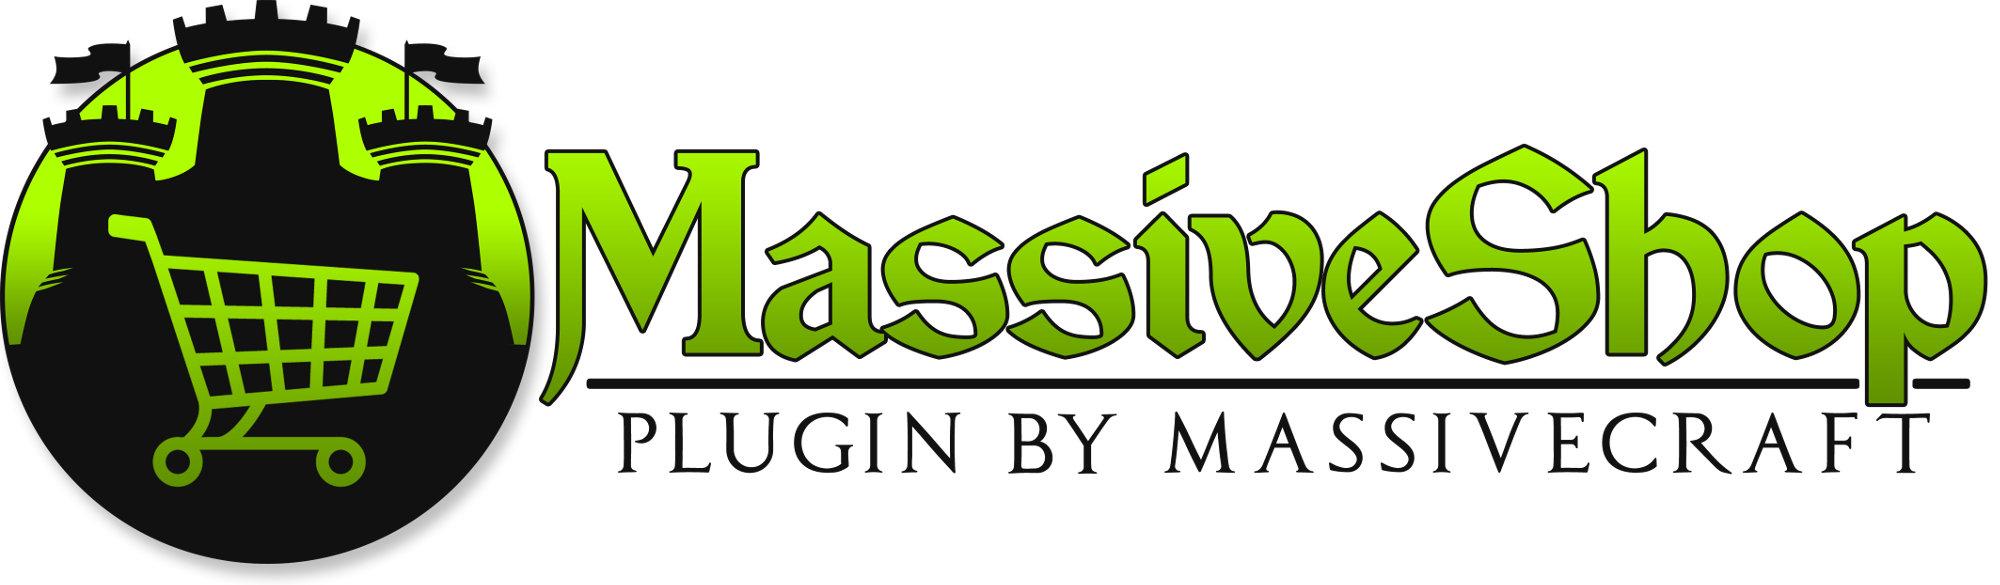 massivecraft-logotype-plugin-massiveshop-2000